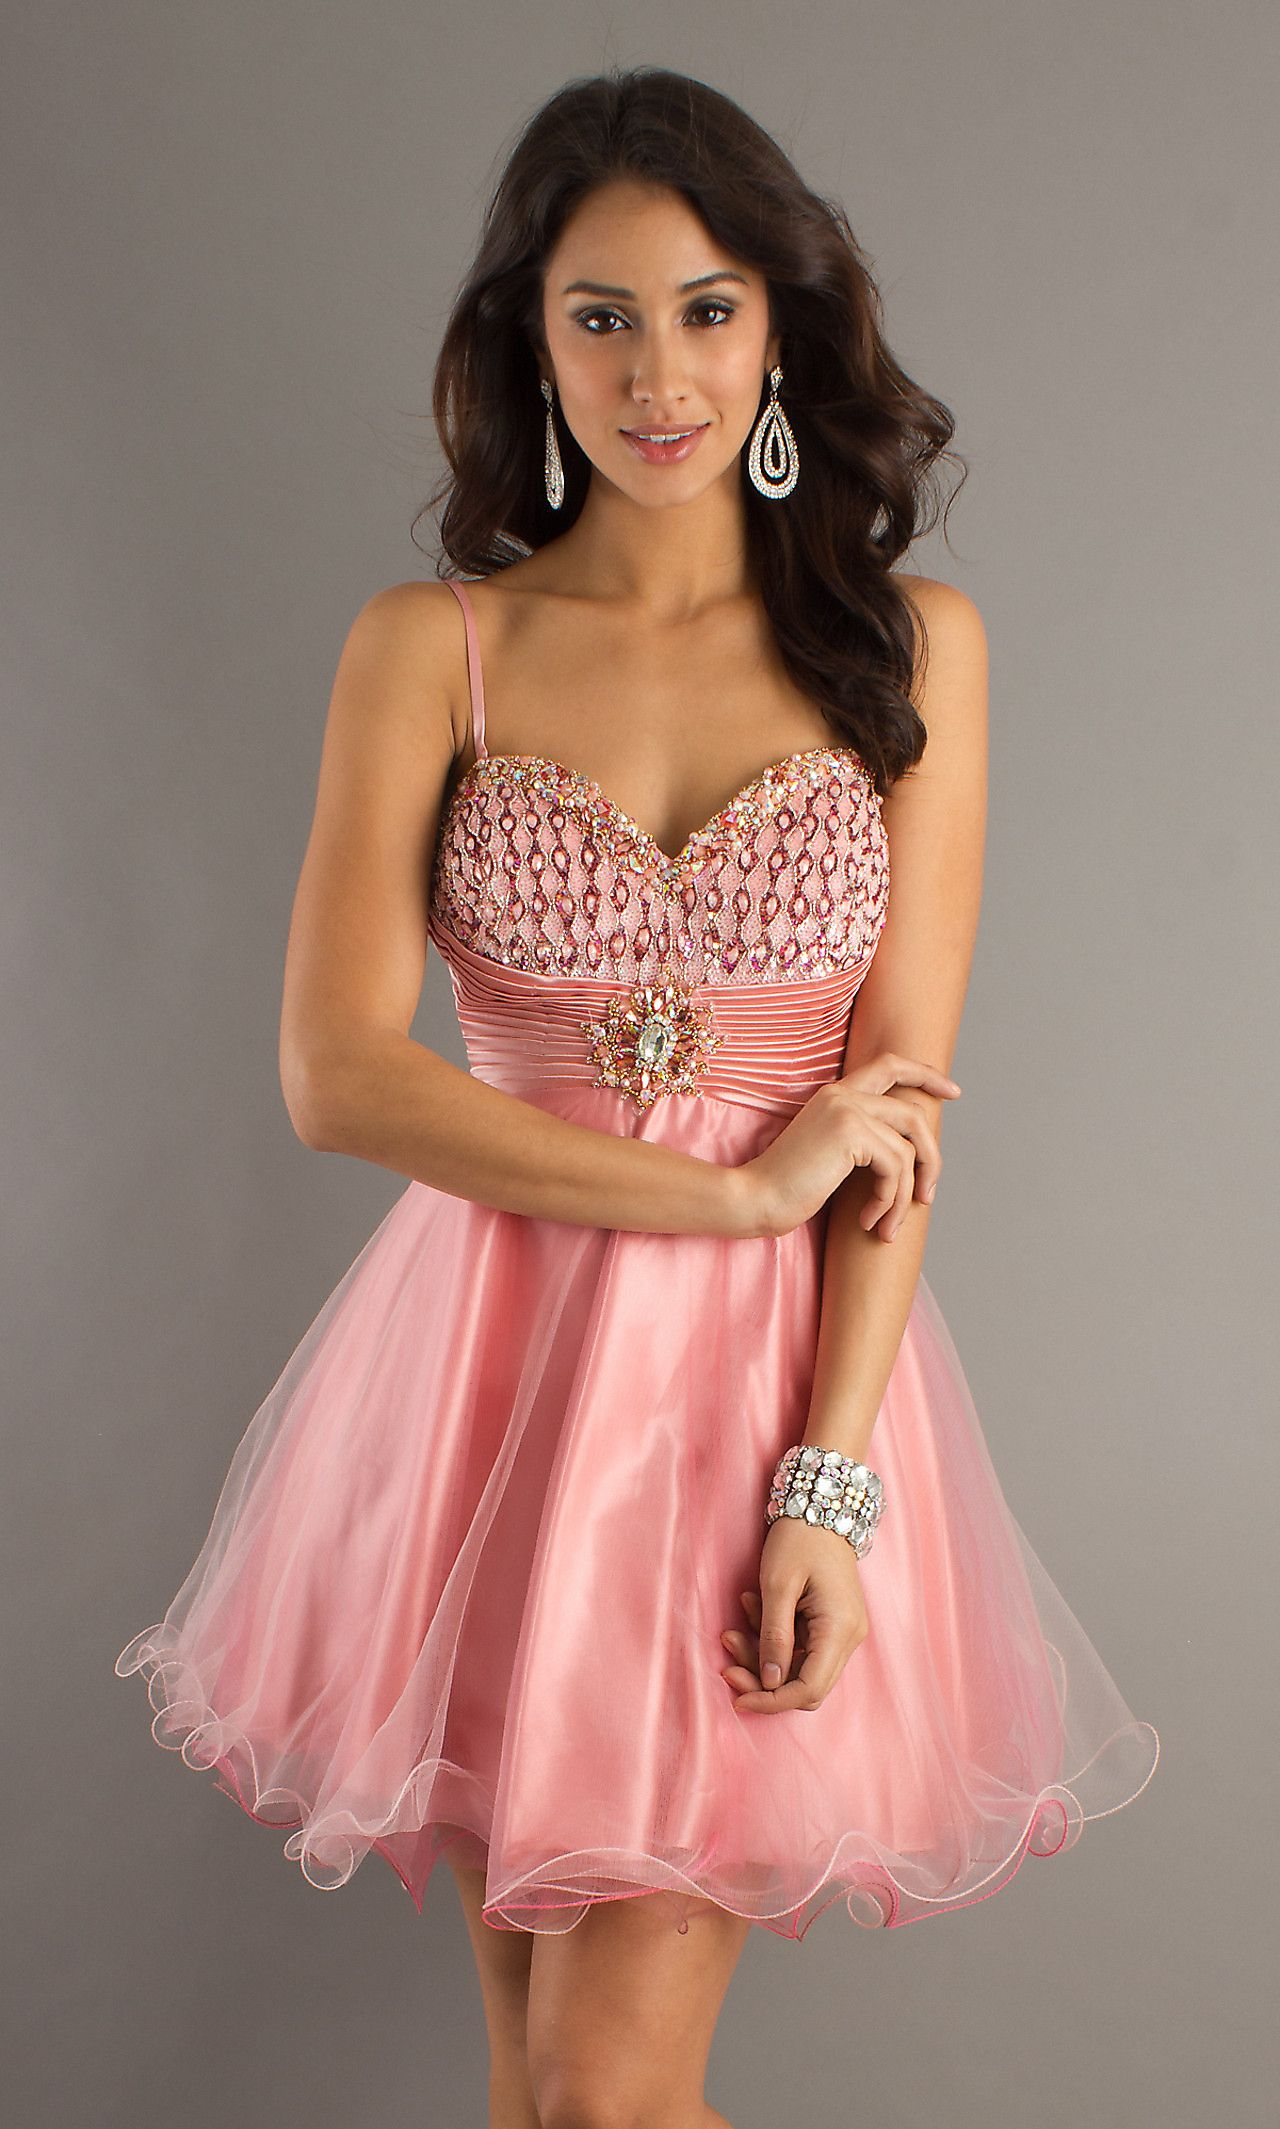 Pink Spaghetti Strap Baby Doll Dress, Pink Dress - Simply Dresses ...